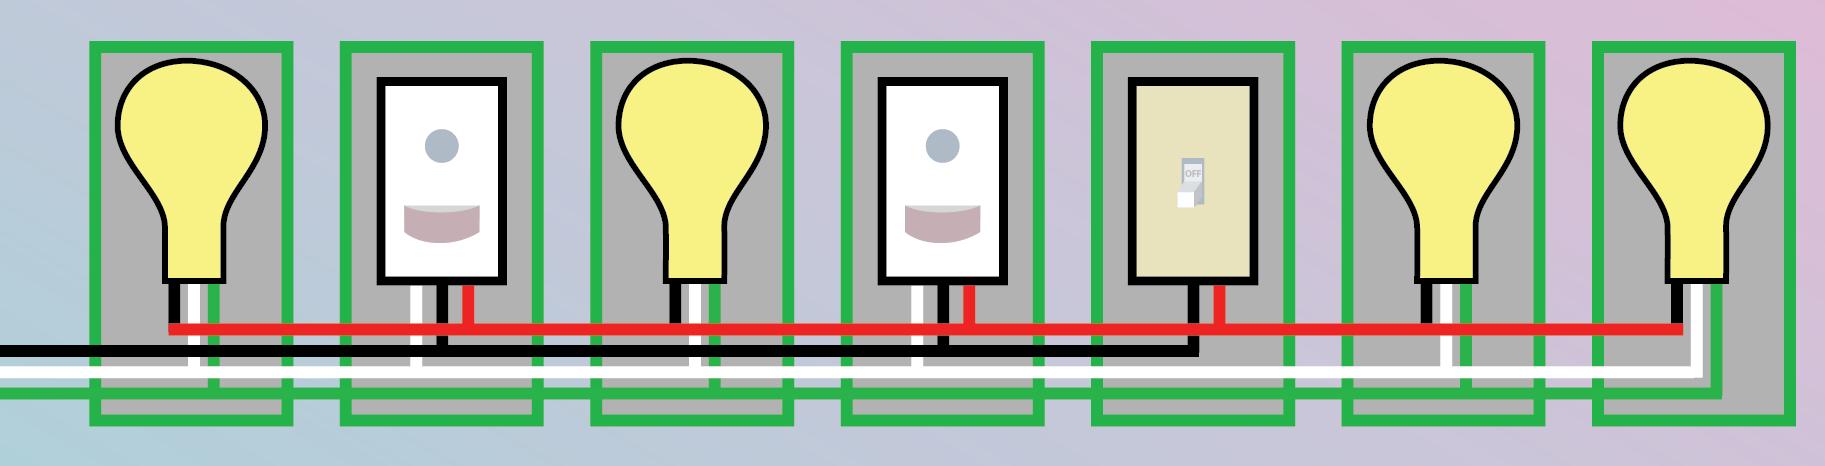 hight resolution of enter image description here electrical multiple motion